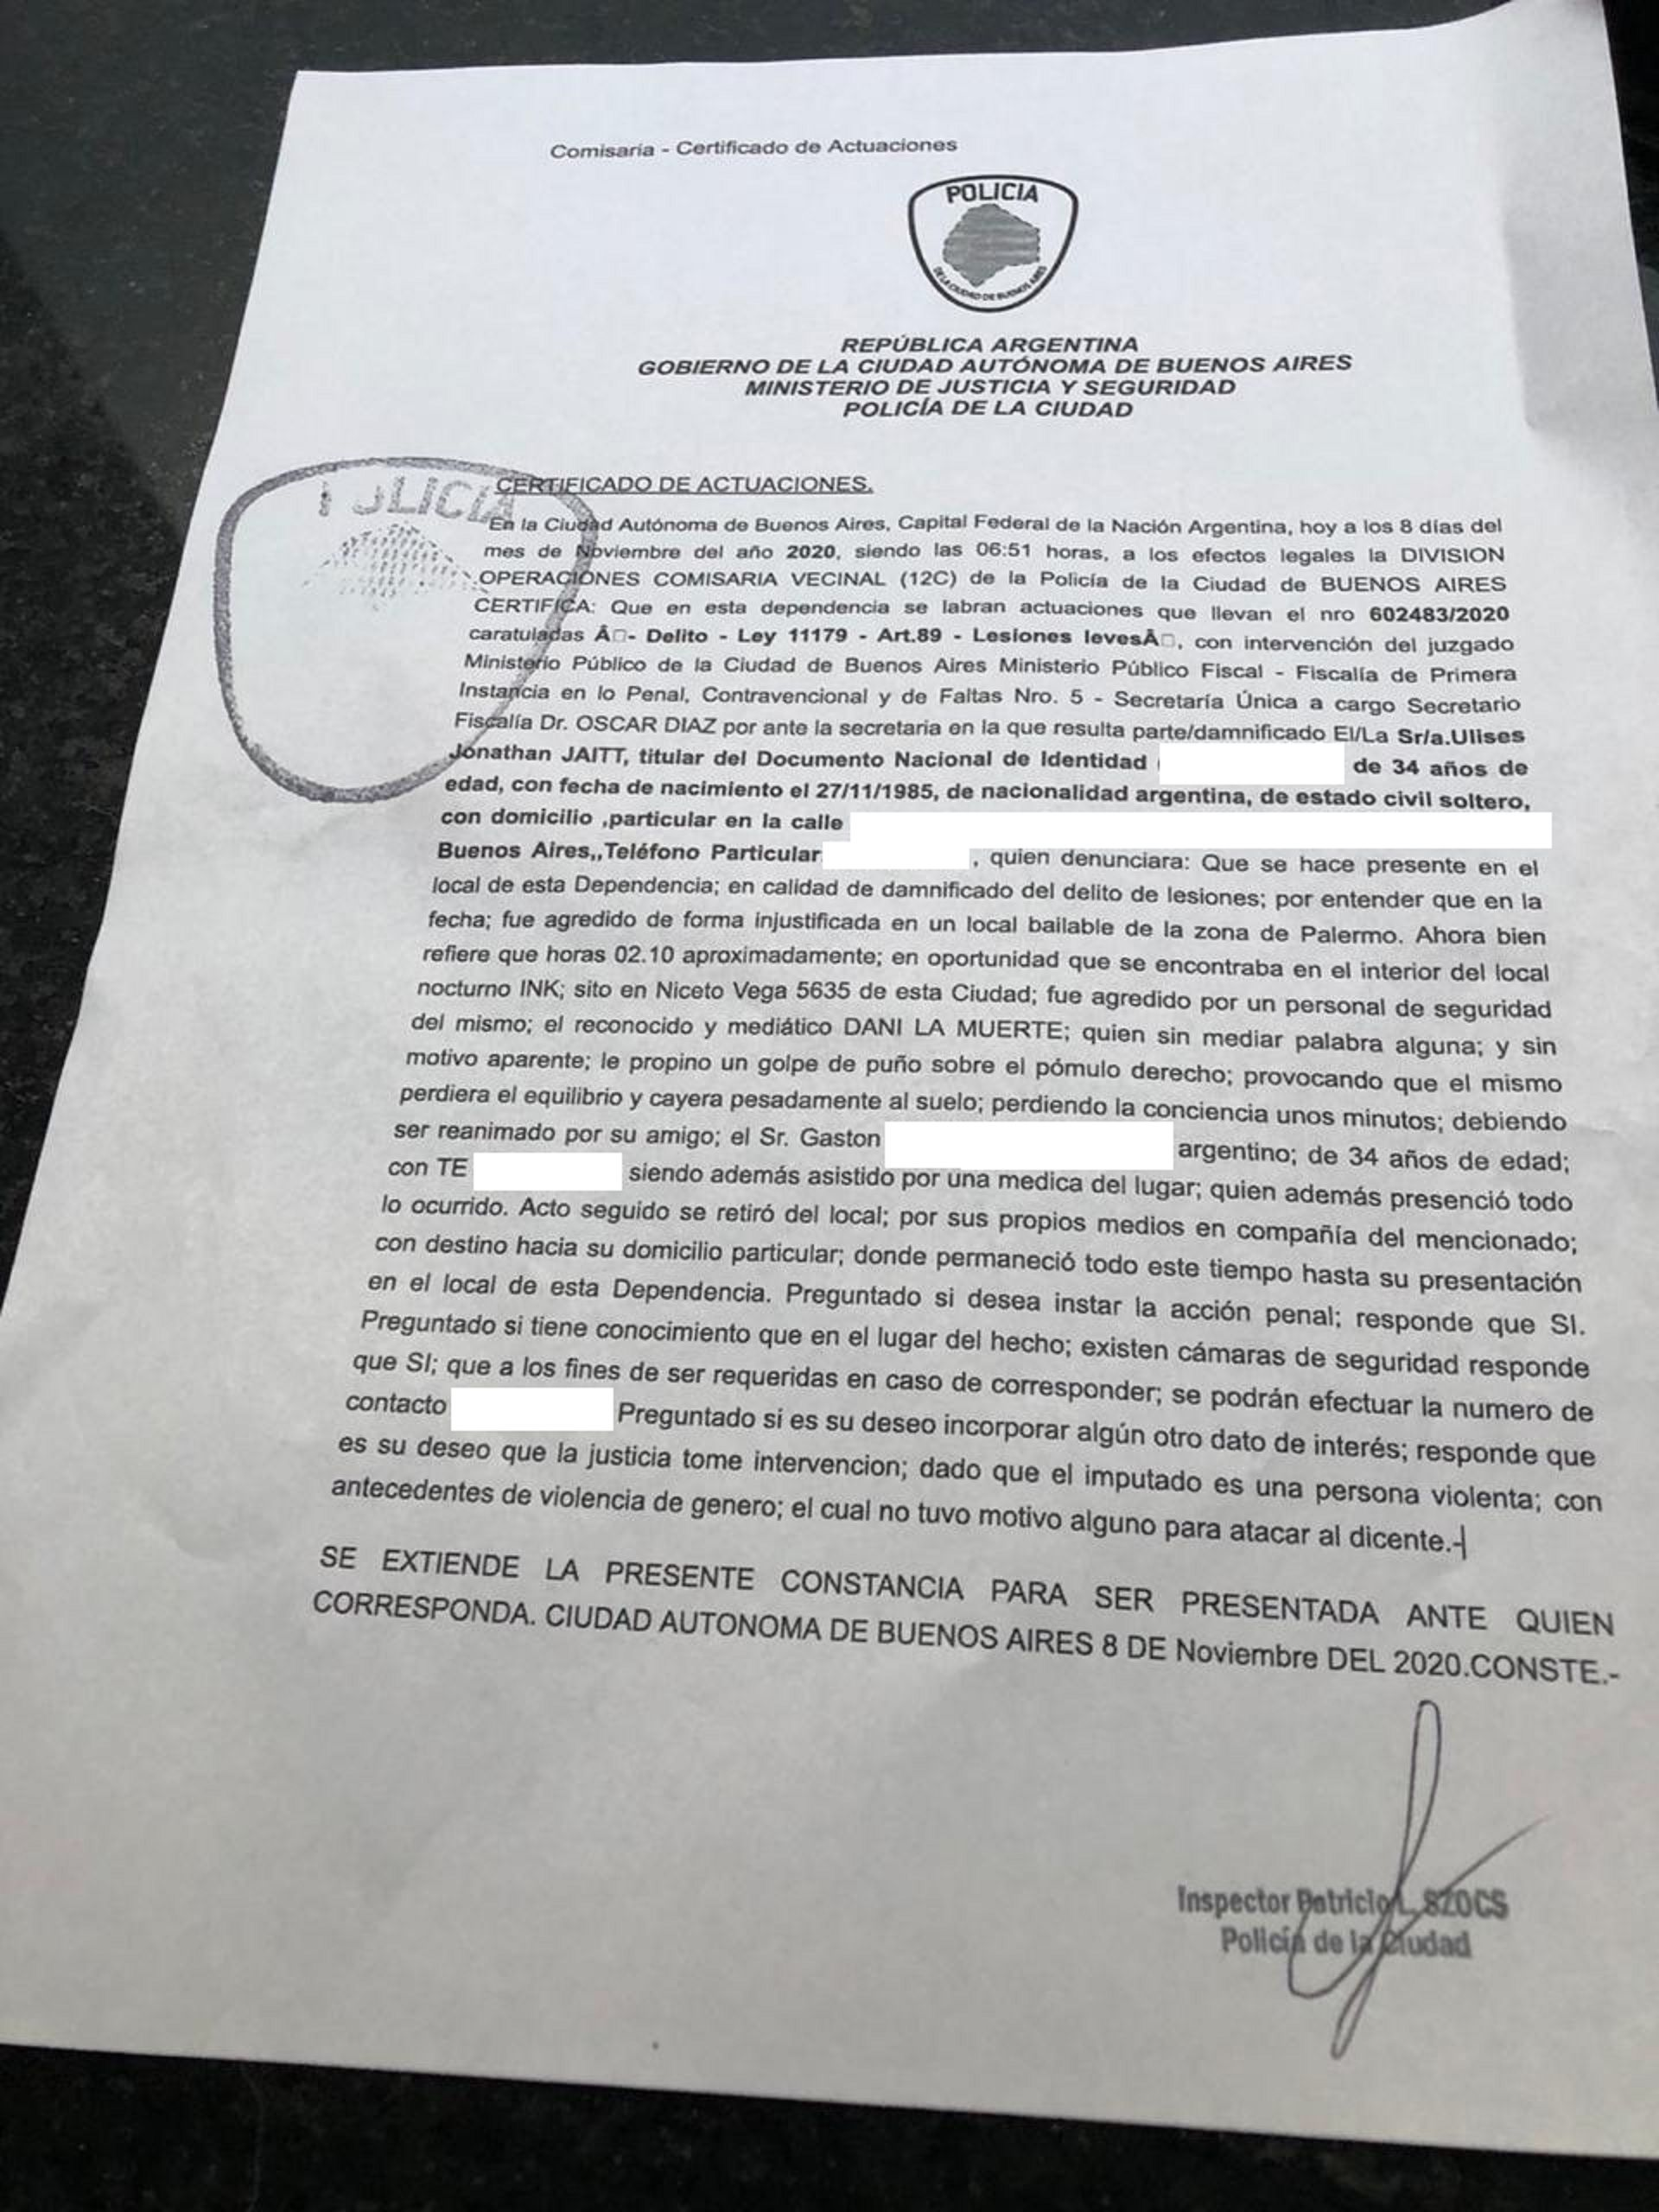 La denuncia policial de Ulises Jaitt contra Dany La Muerte